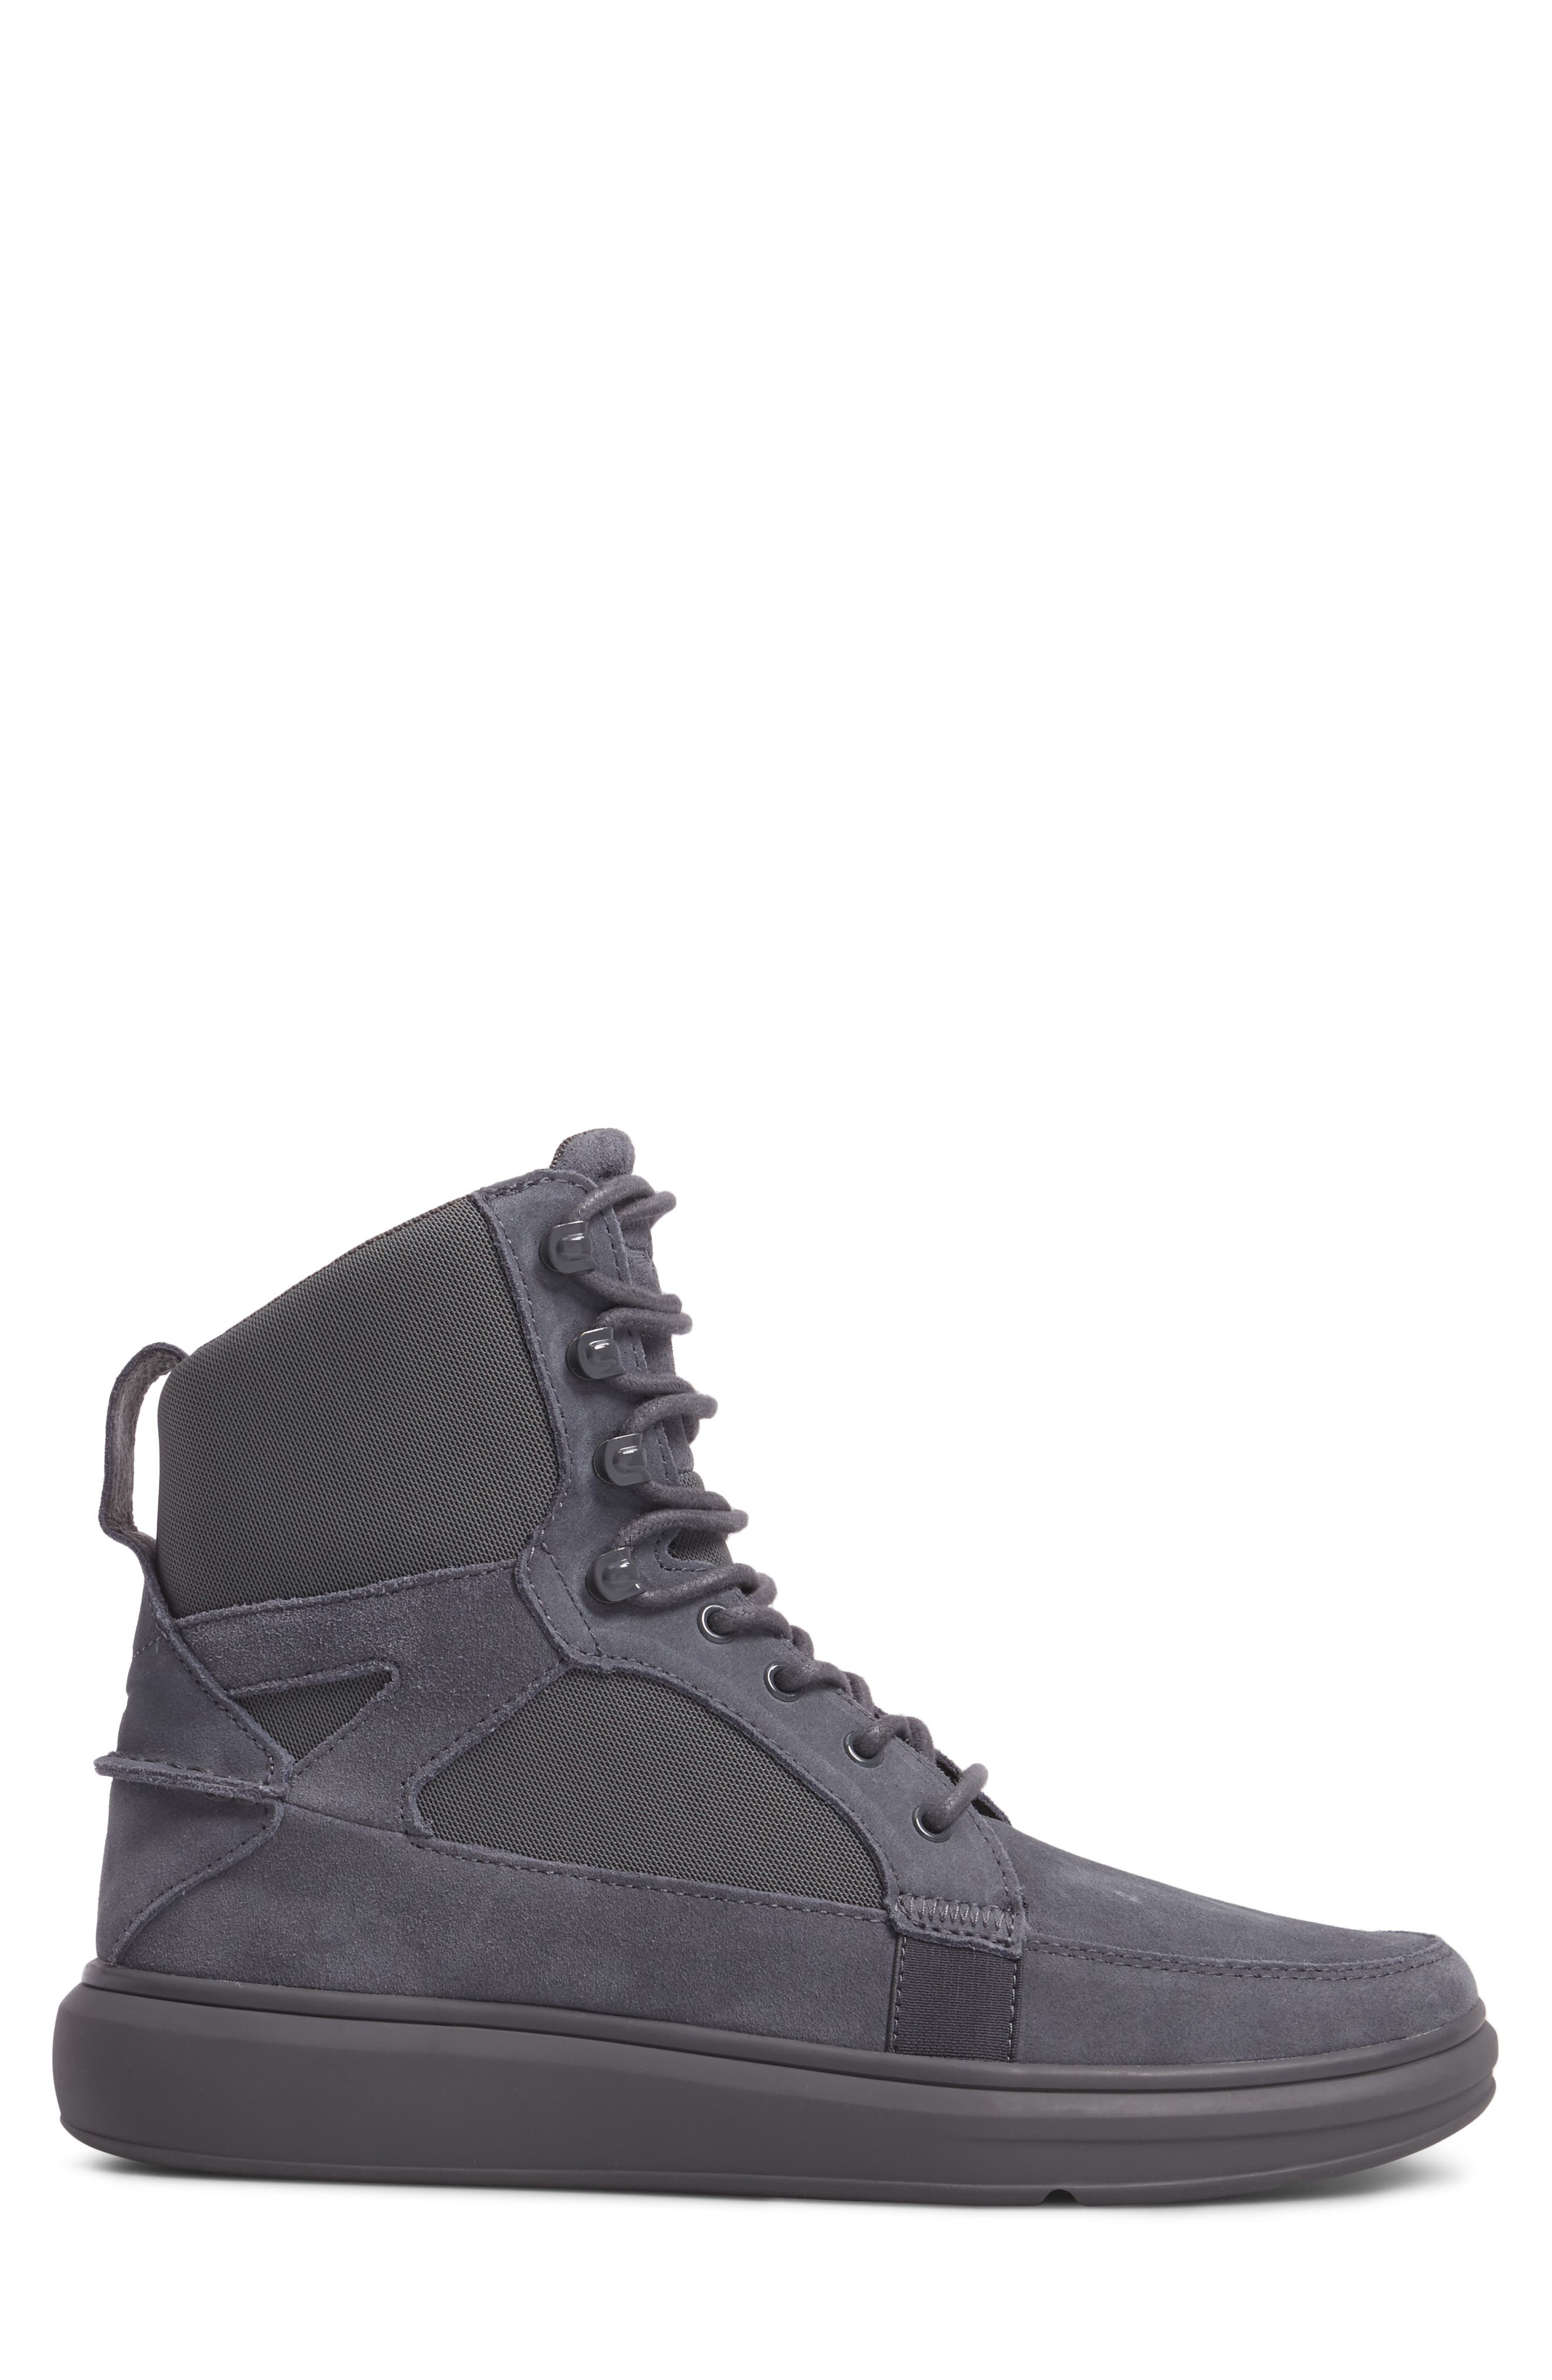 Desimo Sneaker,                             Alternate thumbnail 3, color,                             Smoke Leather